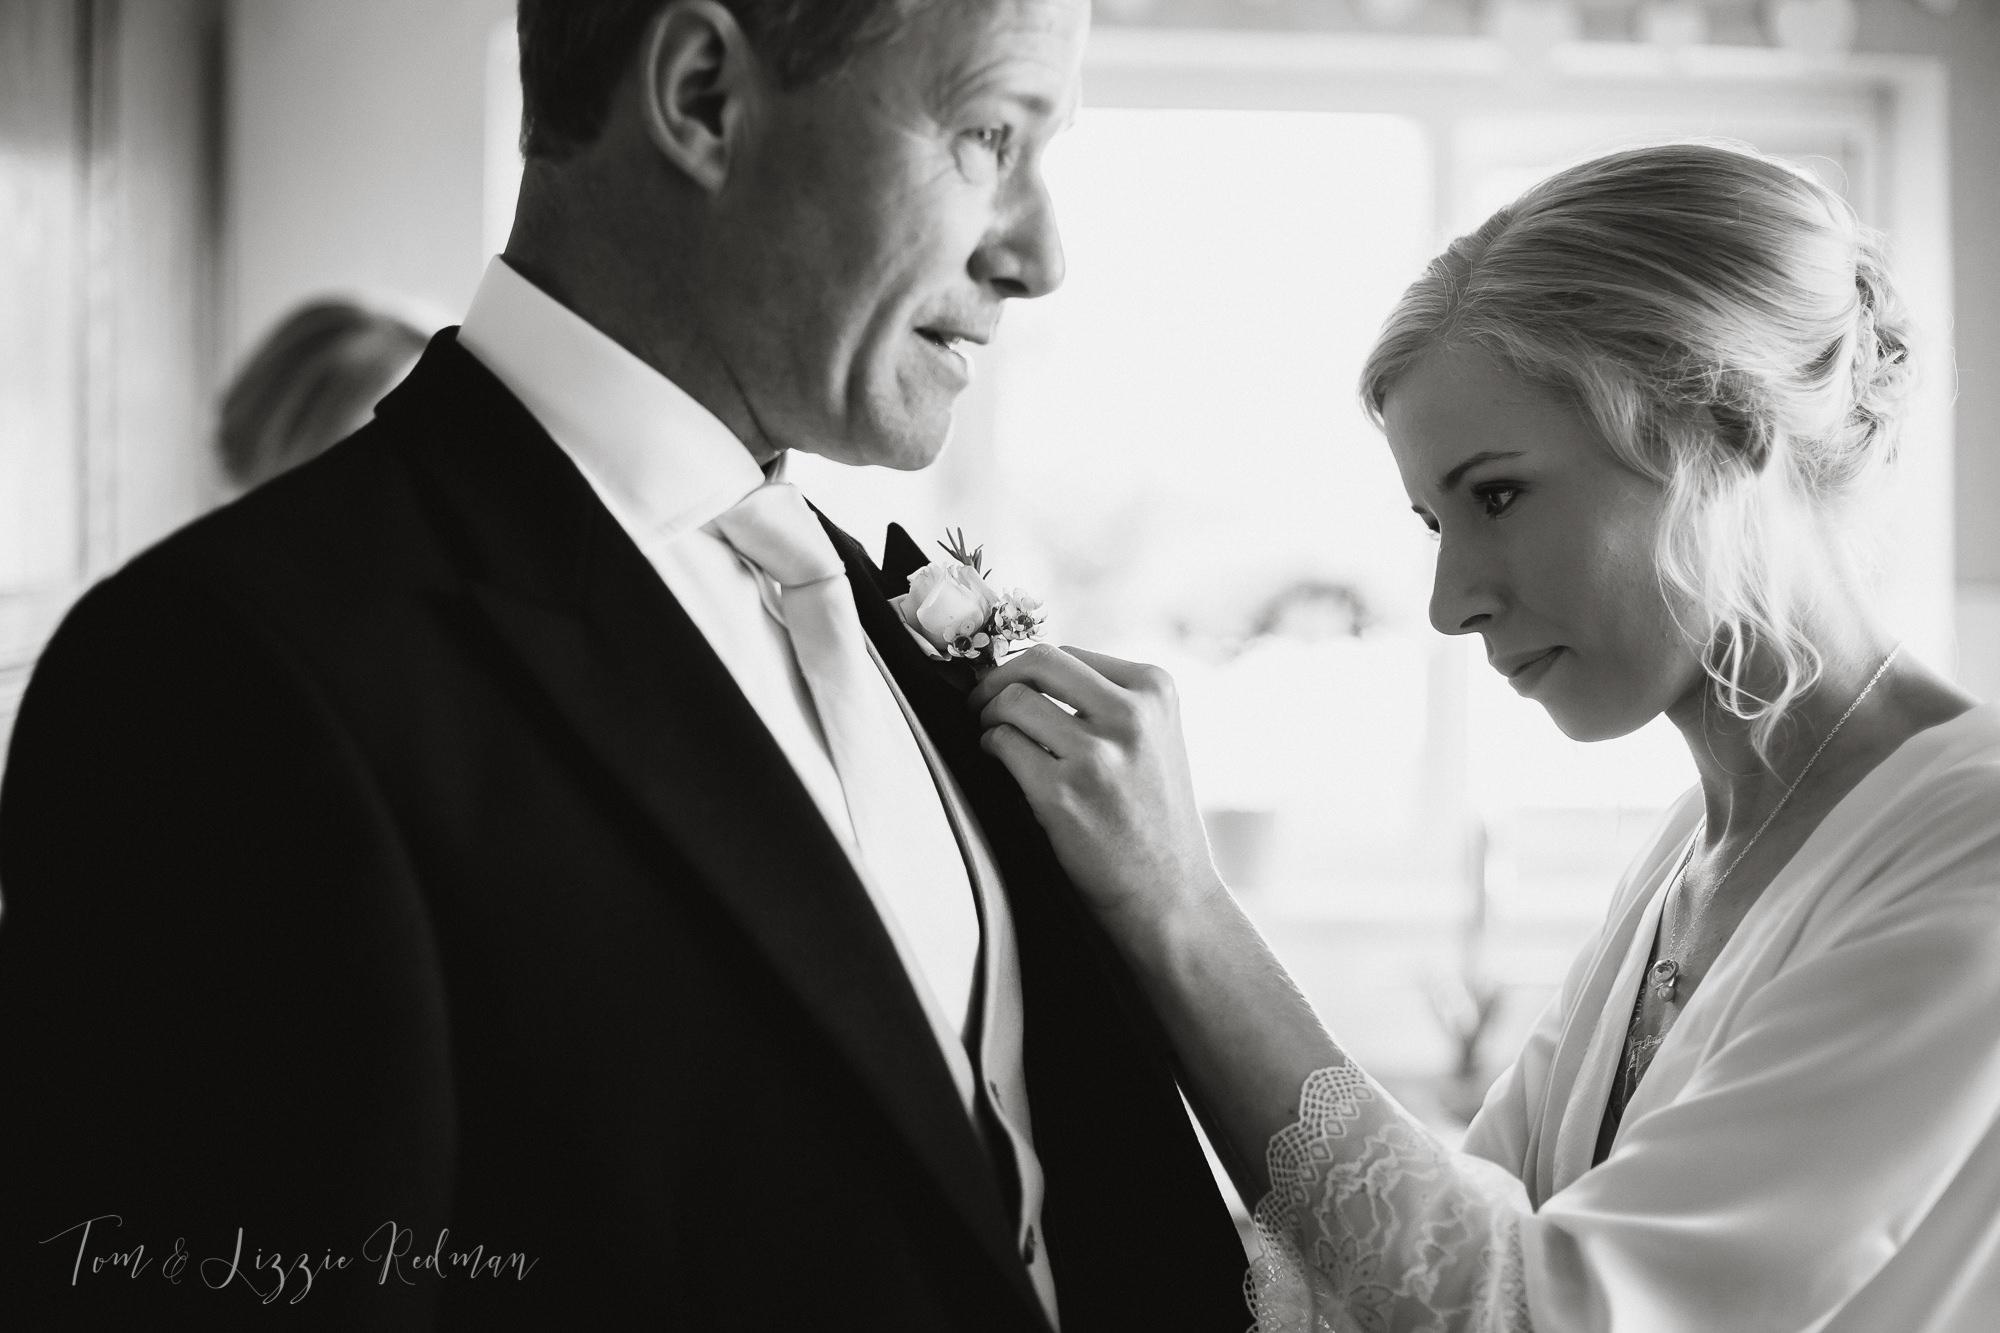 Dorset wedding photographers Tom & Lizzie Redman 003.jpg